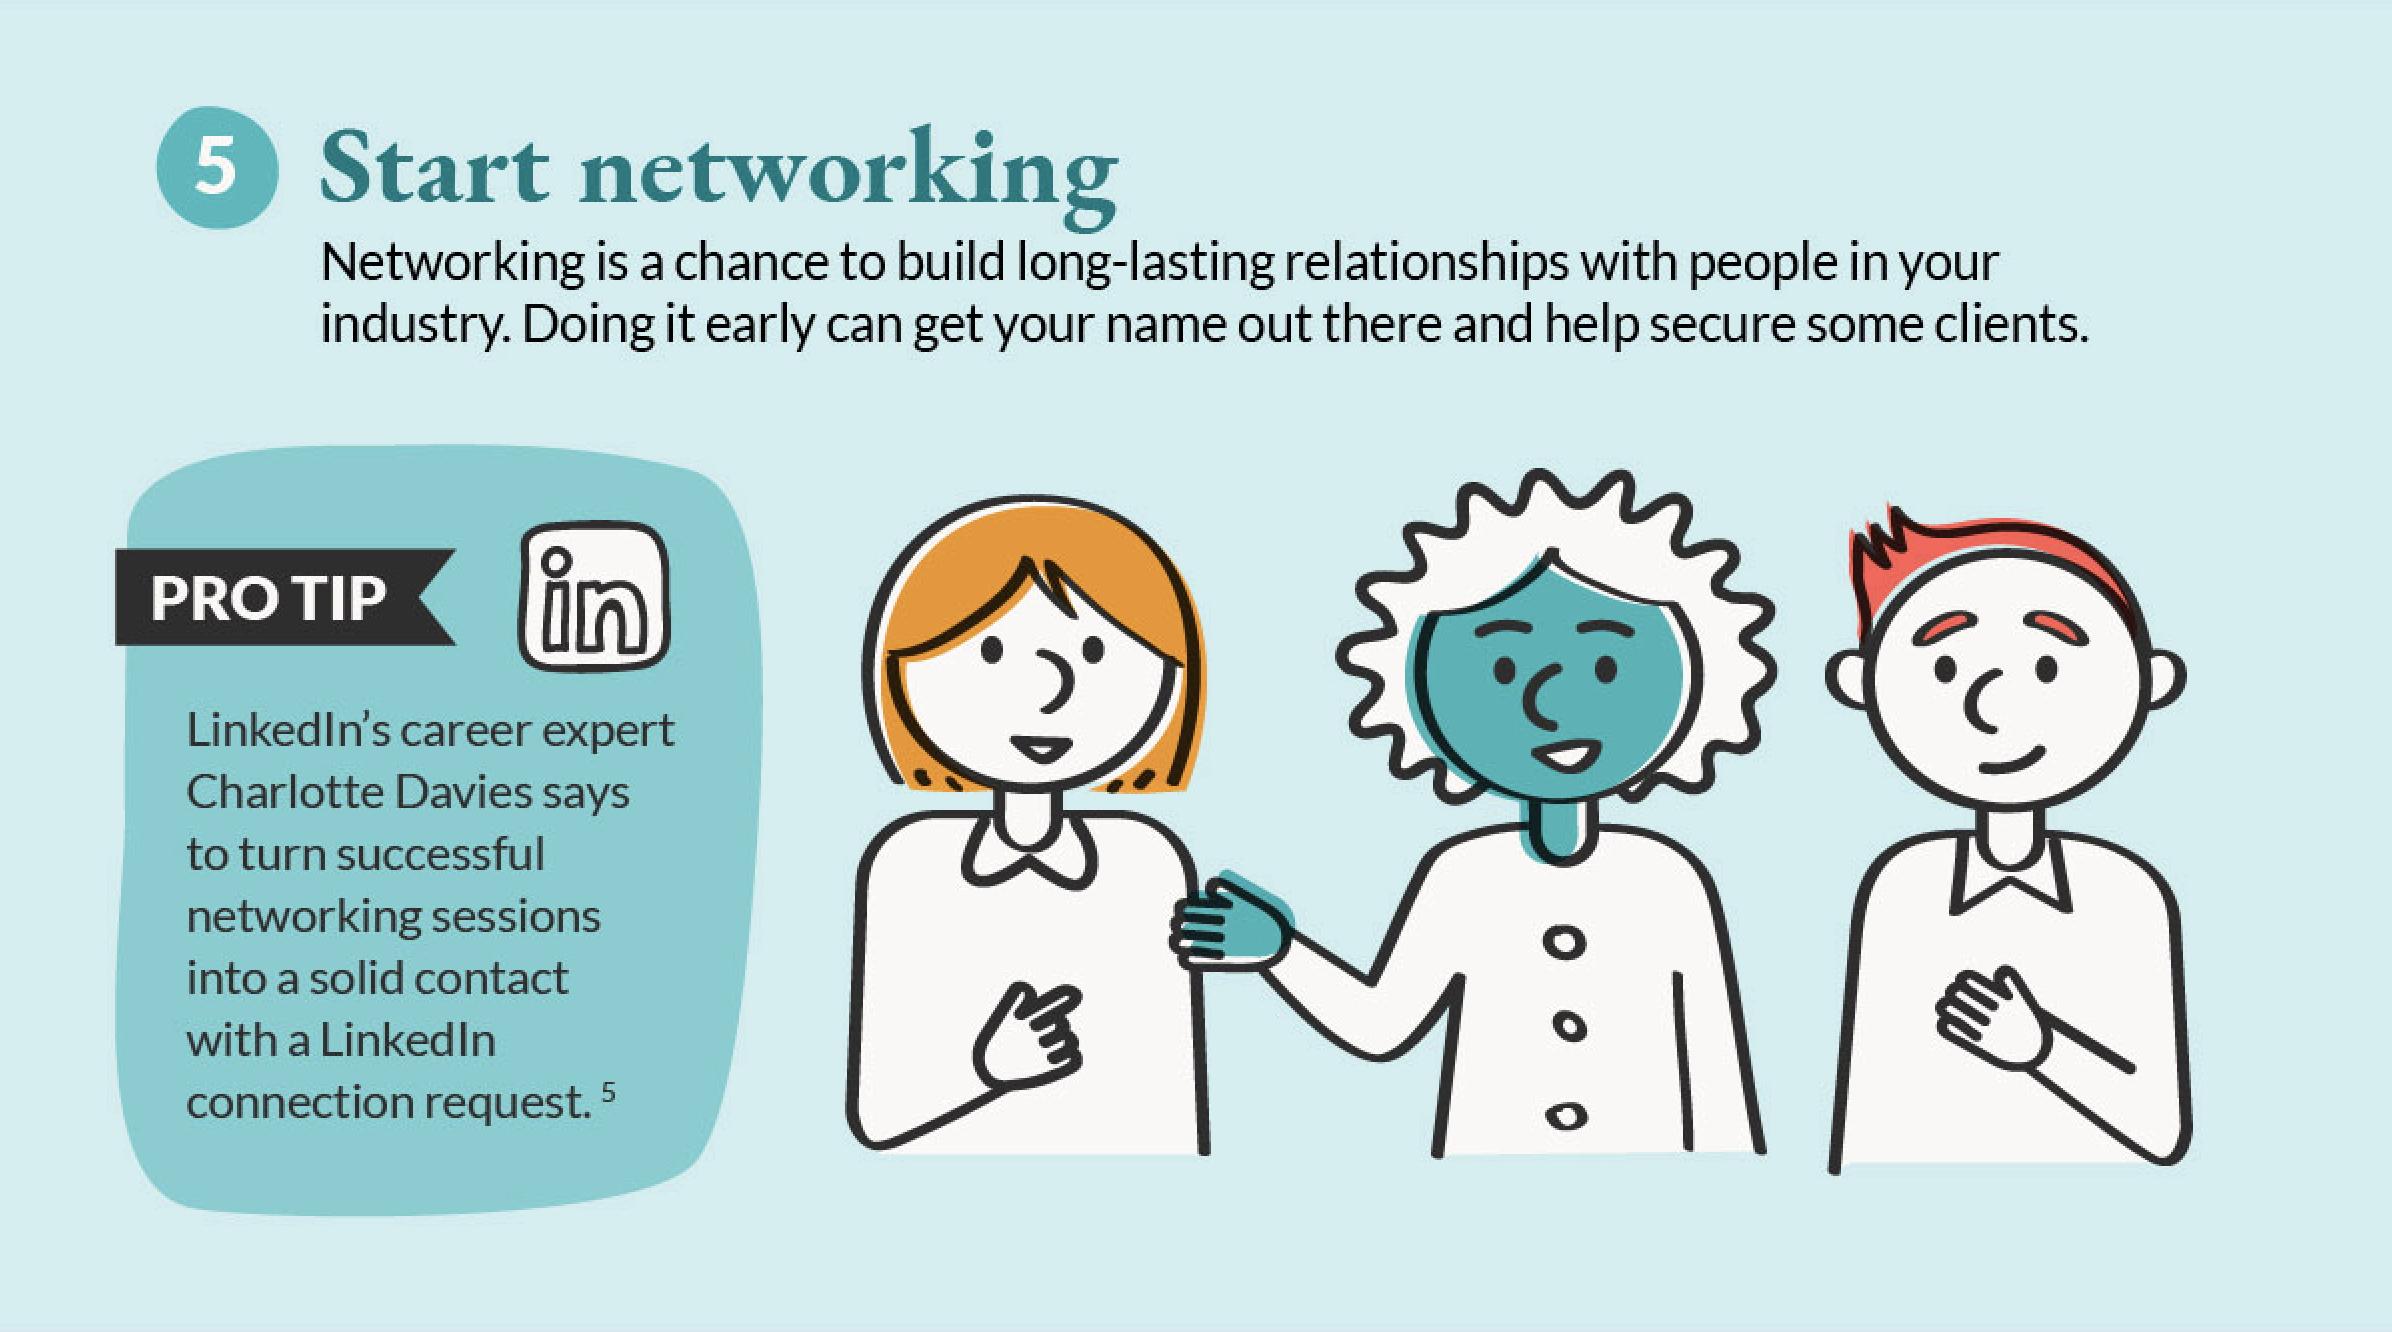 start networking